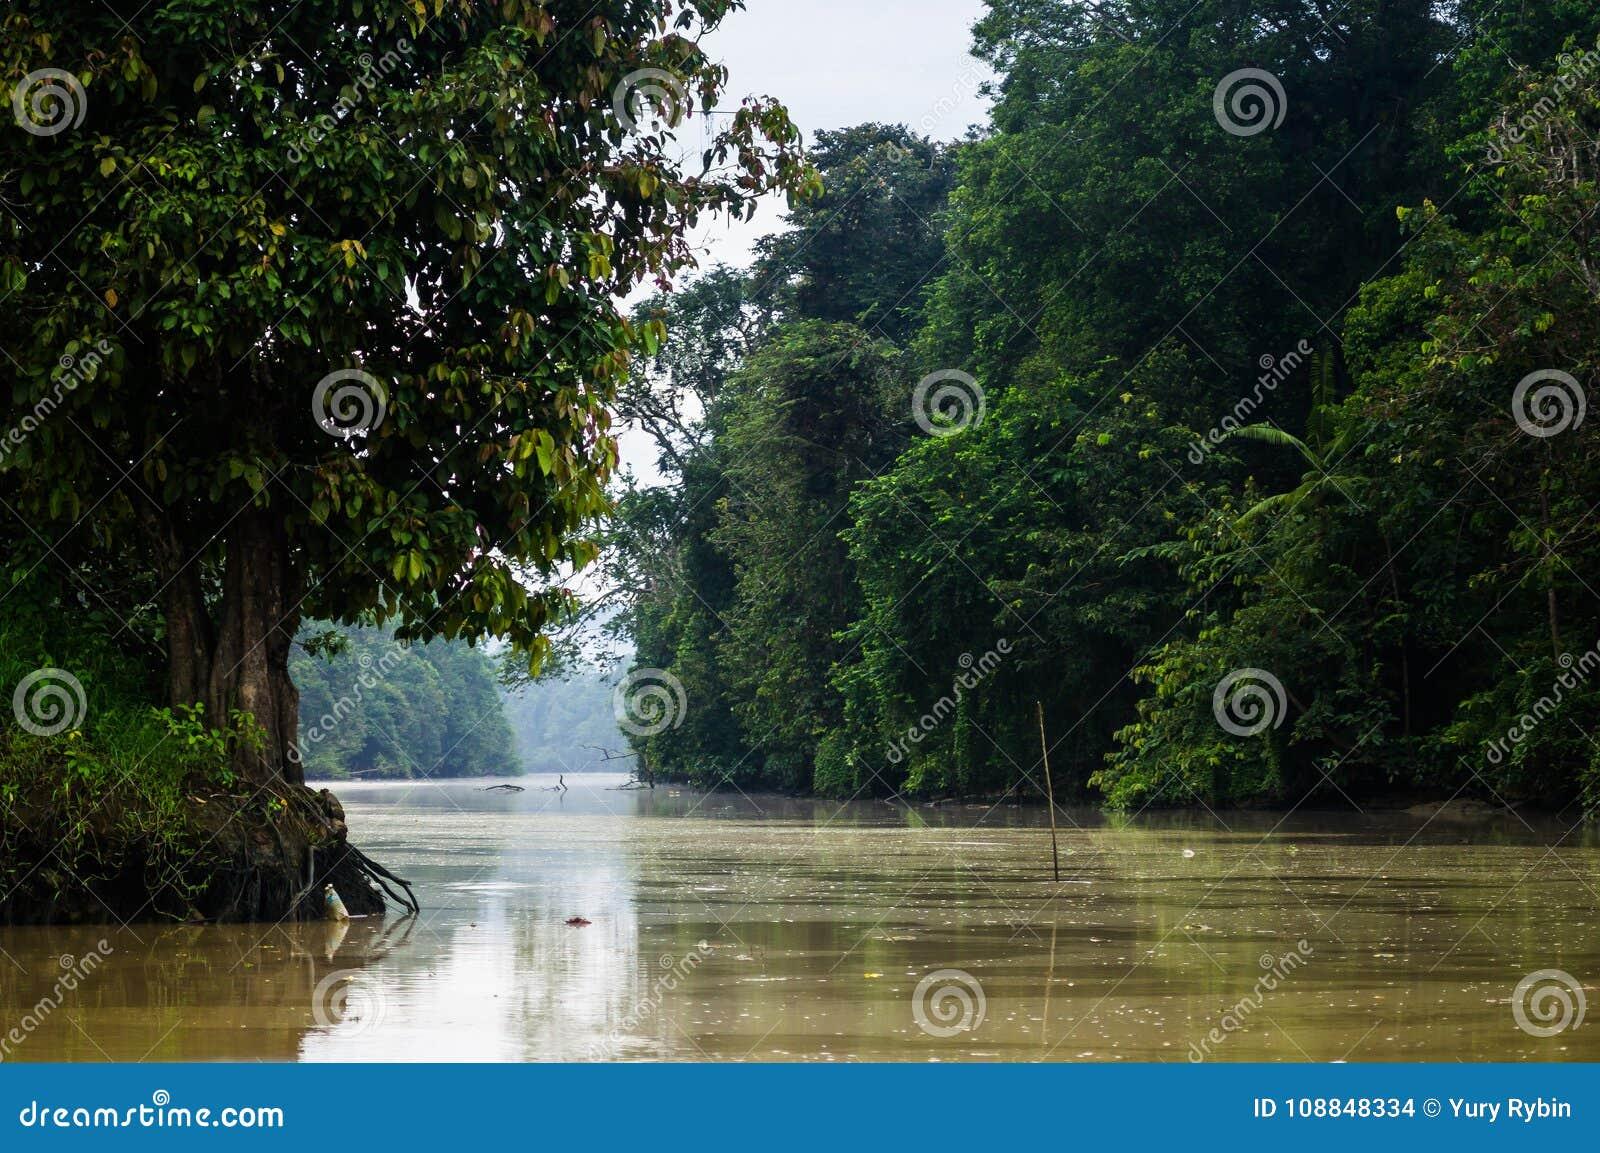 Selva tropical a lo largo del río kinabatangan, Sabah, Borneo malasia